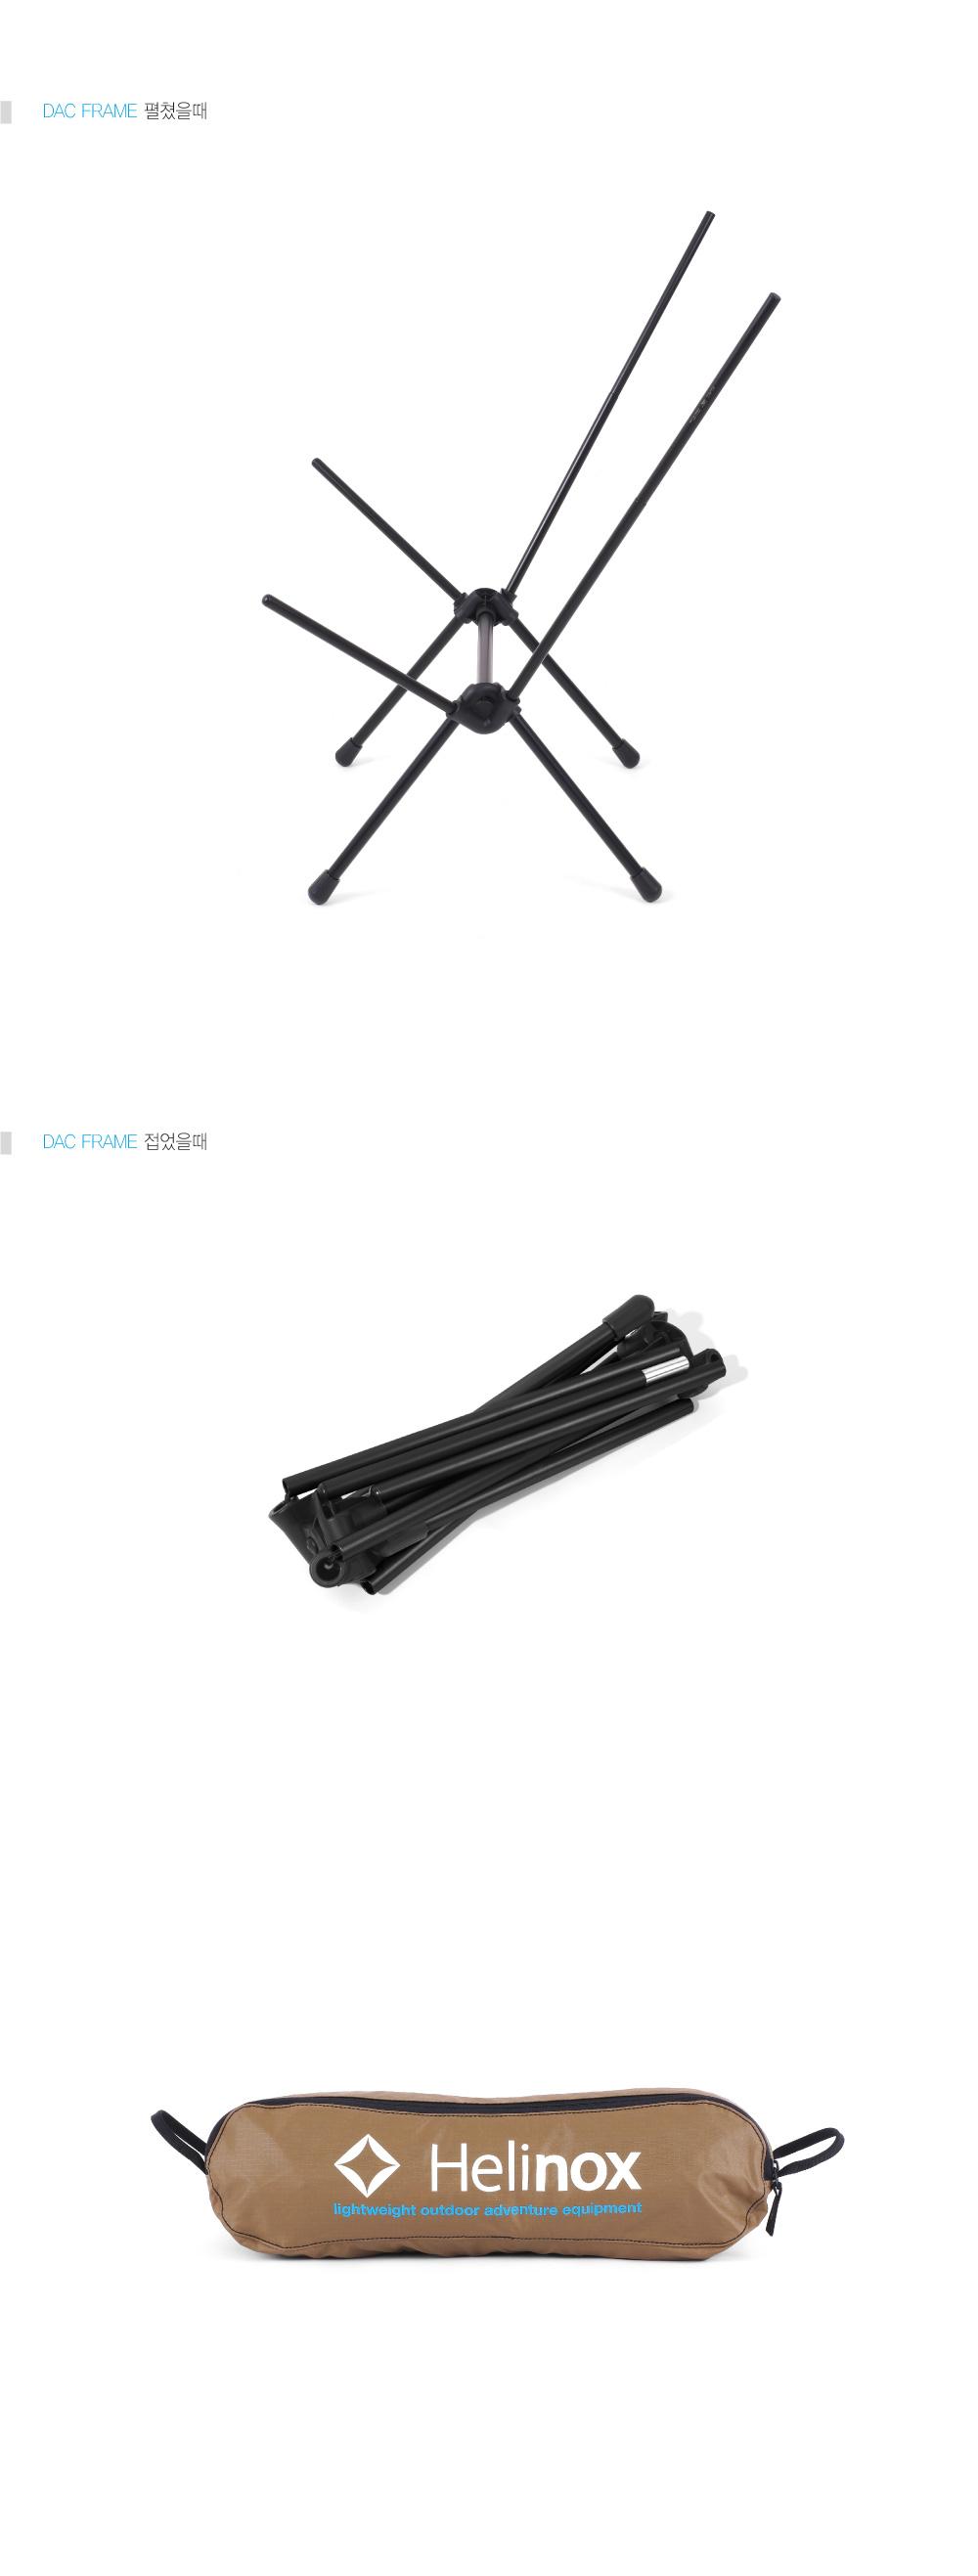 20170613-Helinox_chair-one_XL--coyote-tan-상품페이지-2.jpg